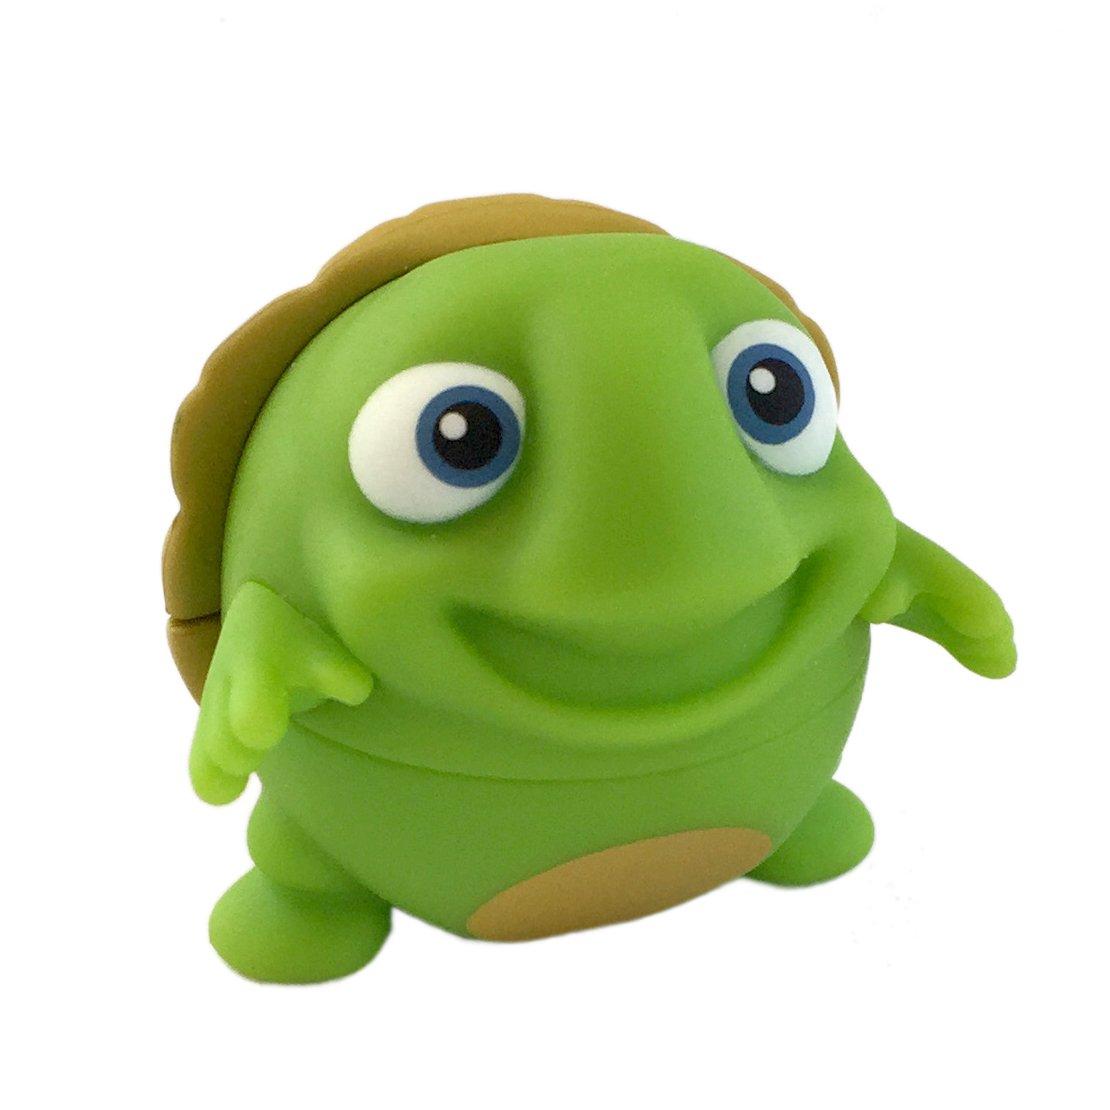 Amazon.com: BeBe Bartoons Turtle Bebe with Lemon Meringue ...